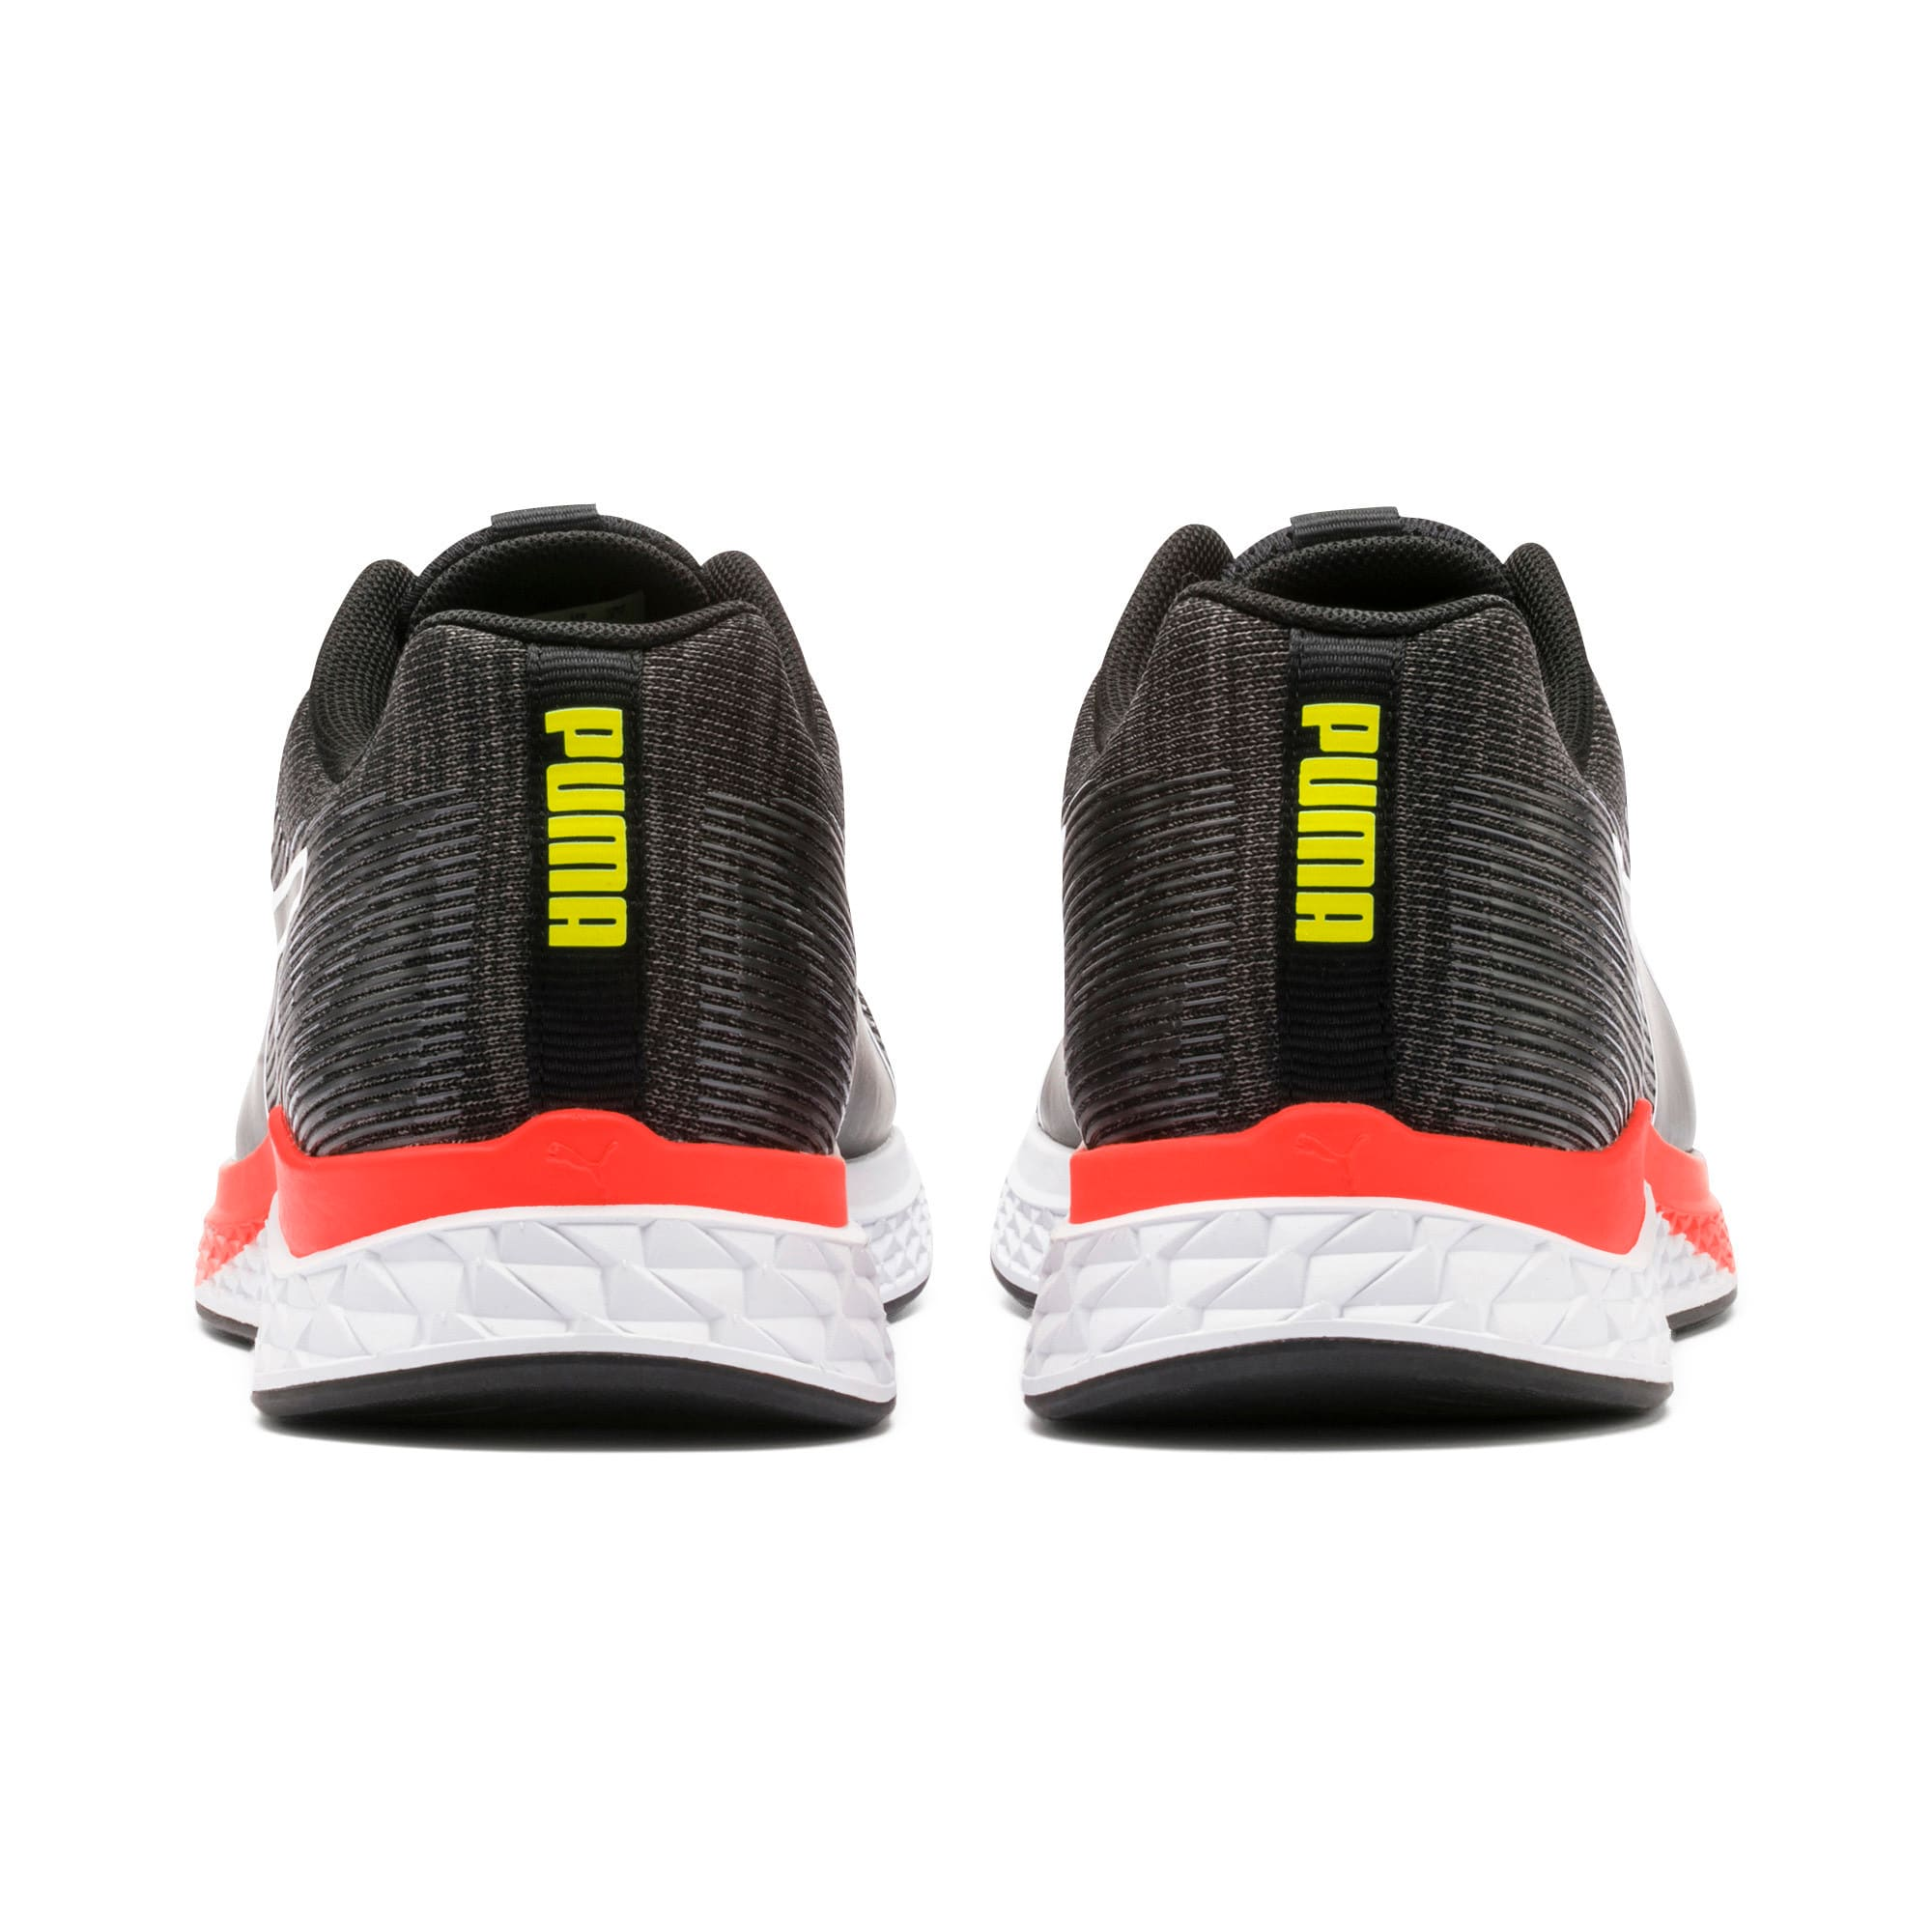 Thumbnail 4 of SPEED SUTAMINA Running Shoes, Black-CASTLEROCK-Yellow-Red, medium